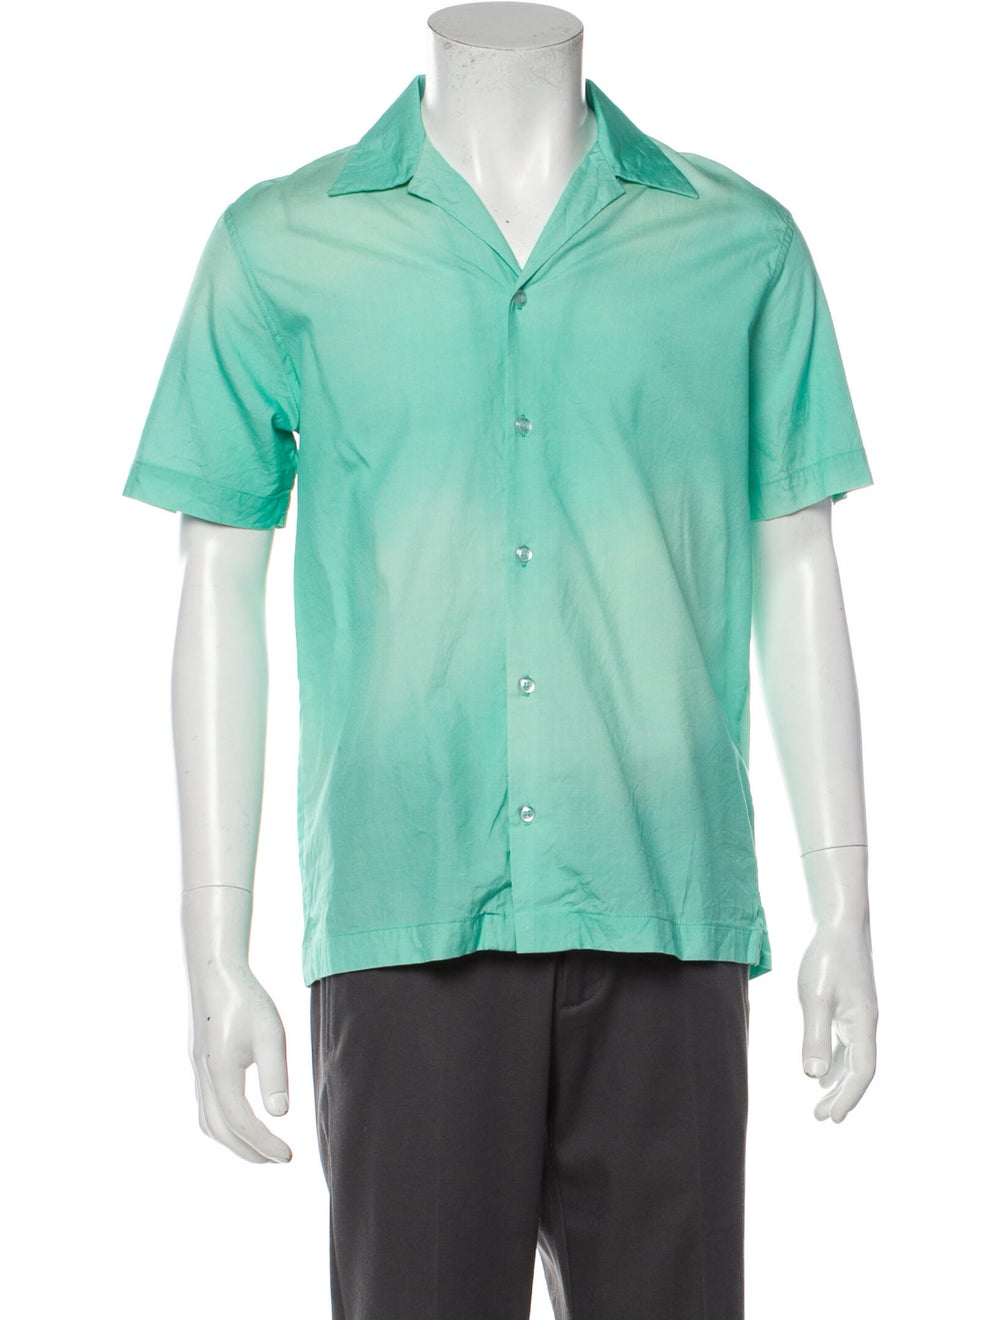 Goodfight Silk Short Sleeve Shirt Green - image 1